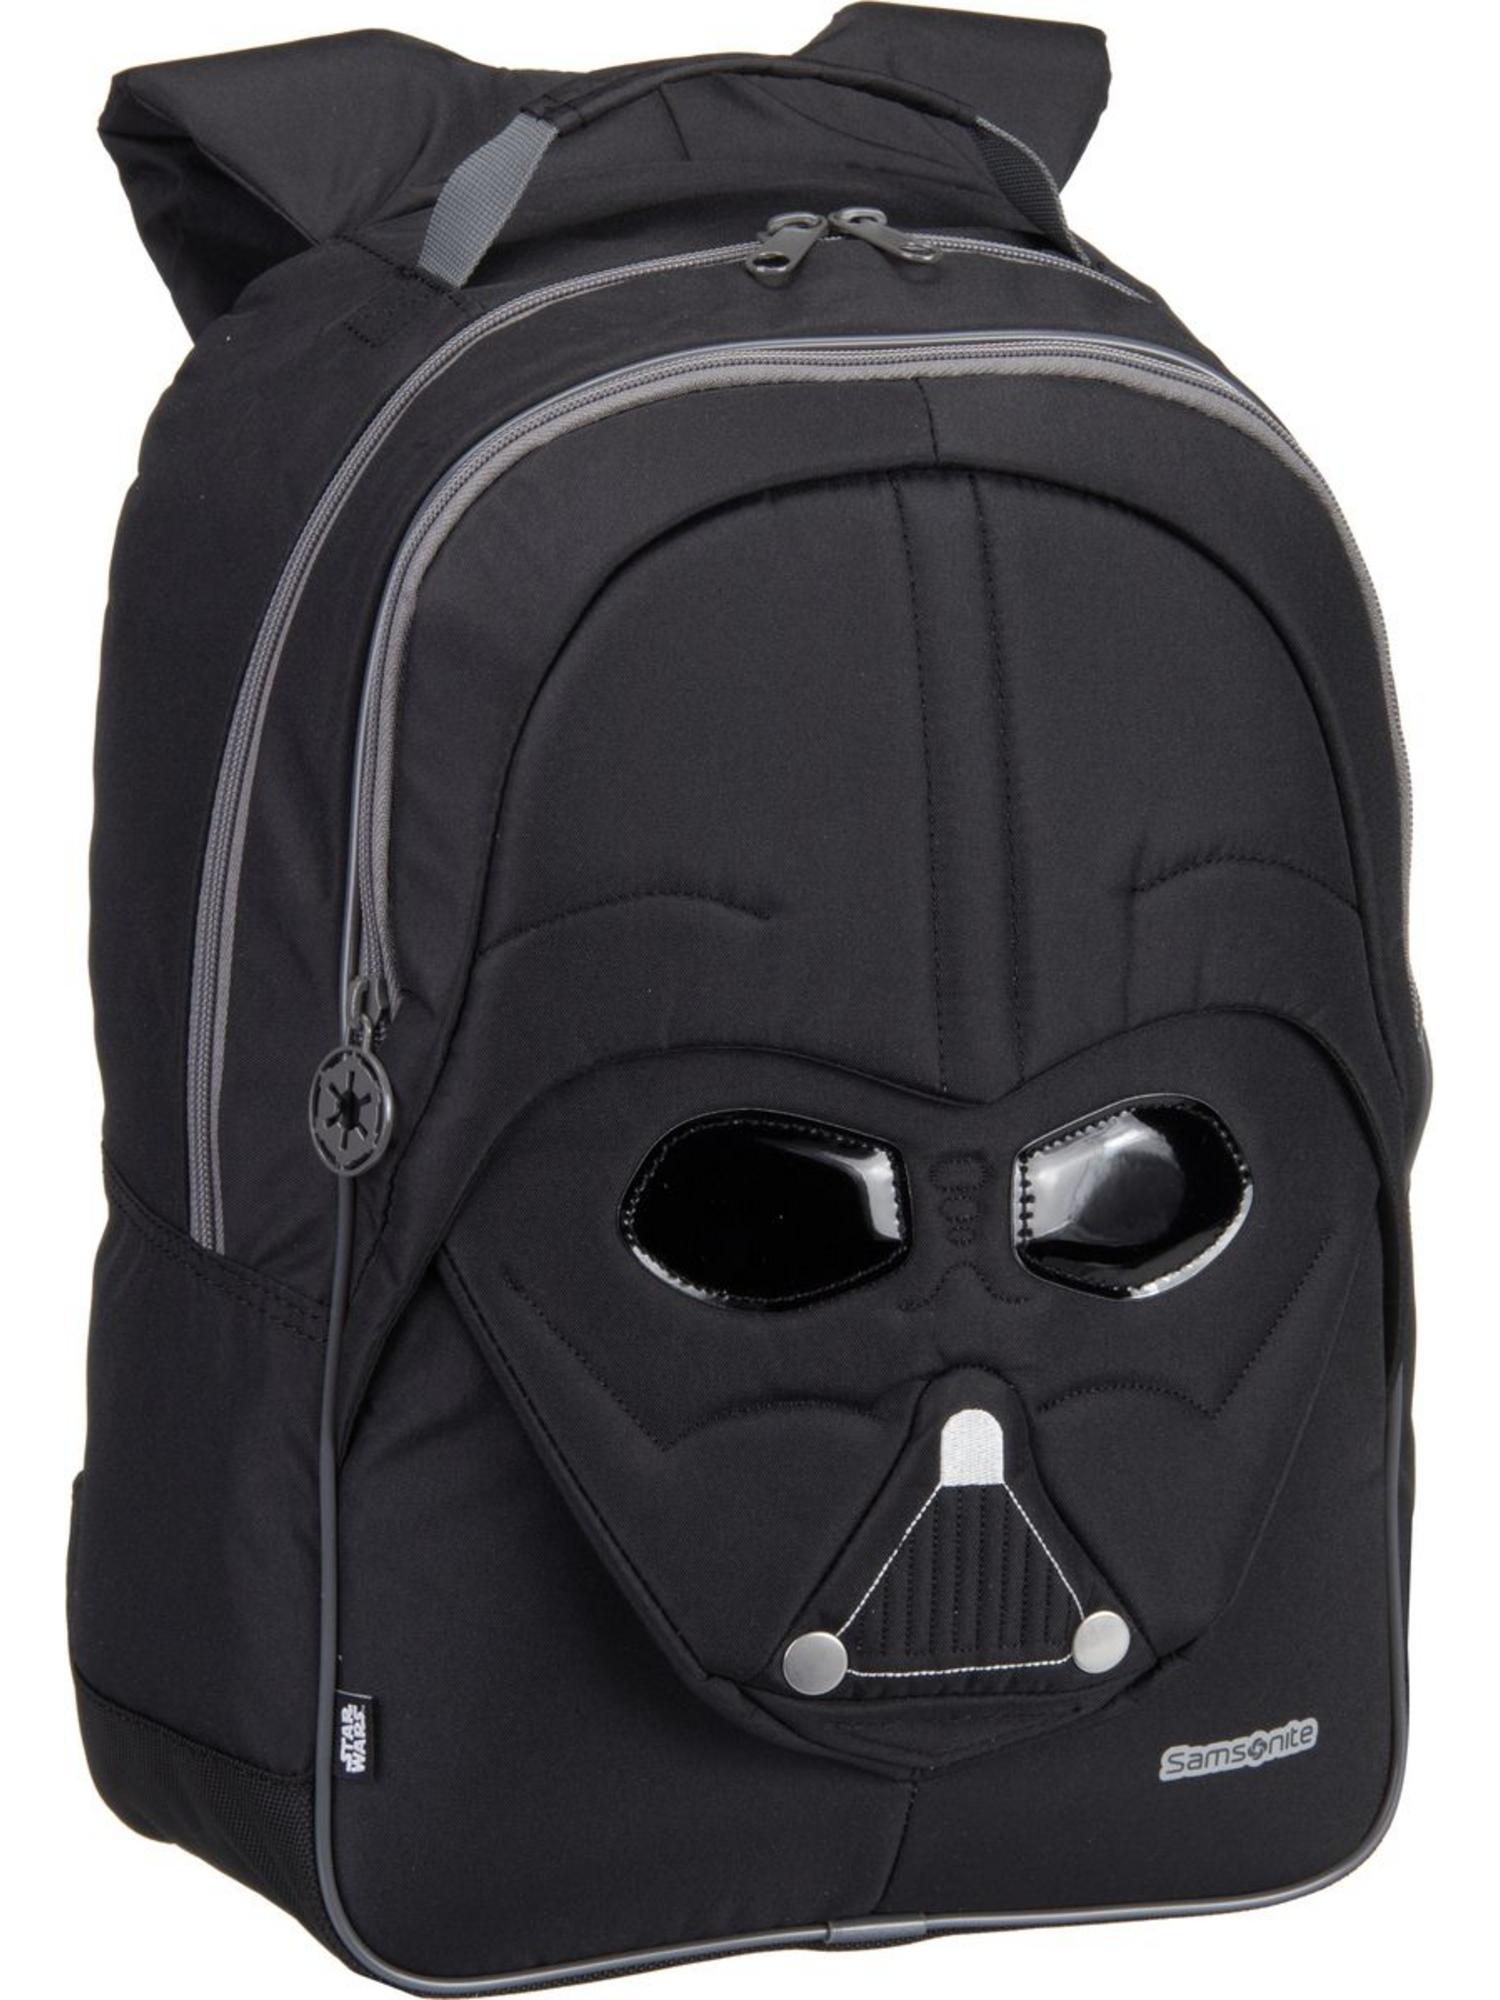 Samsonite Star Wars Ultimate Backpack M Rucksack Daypack